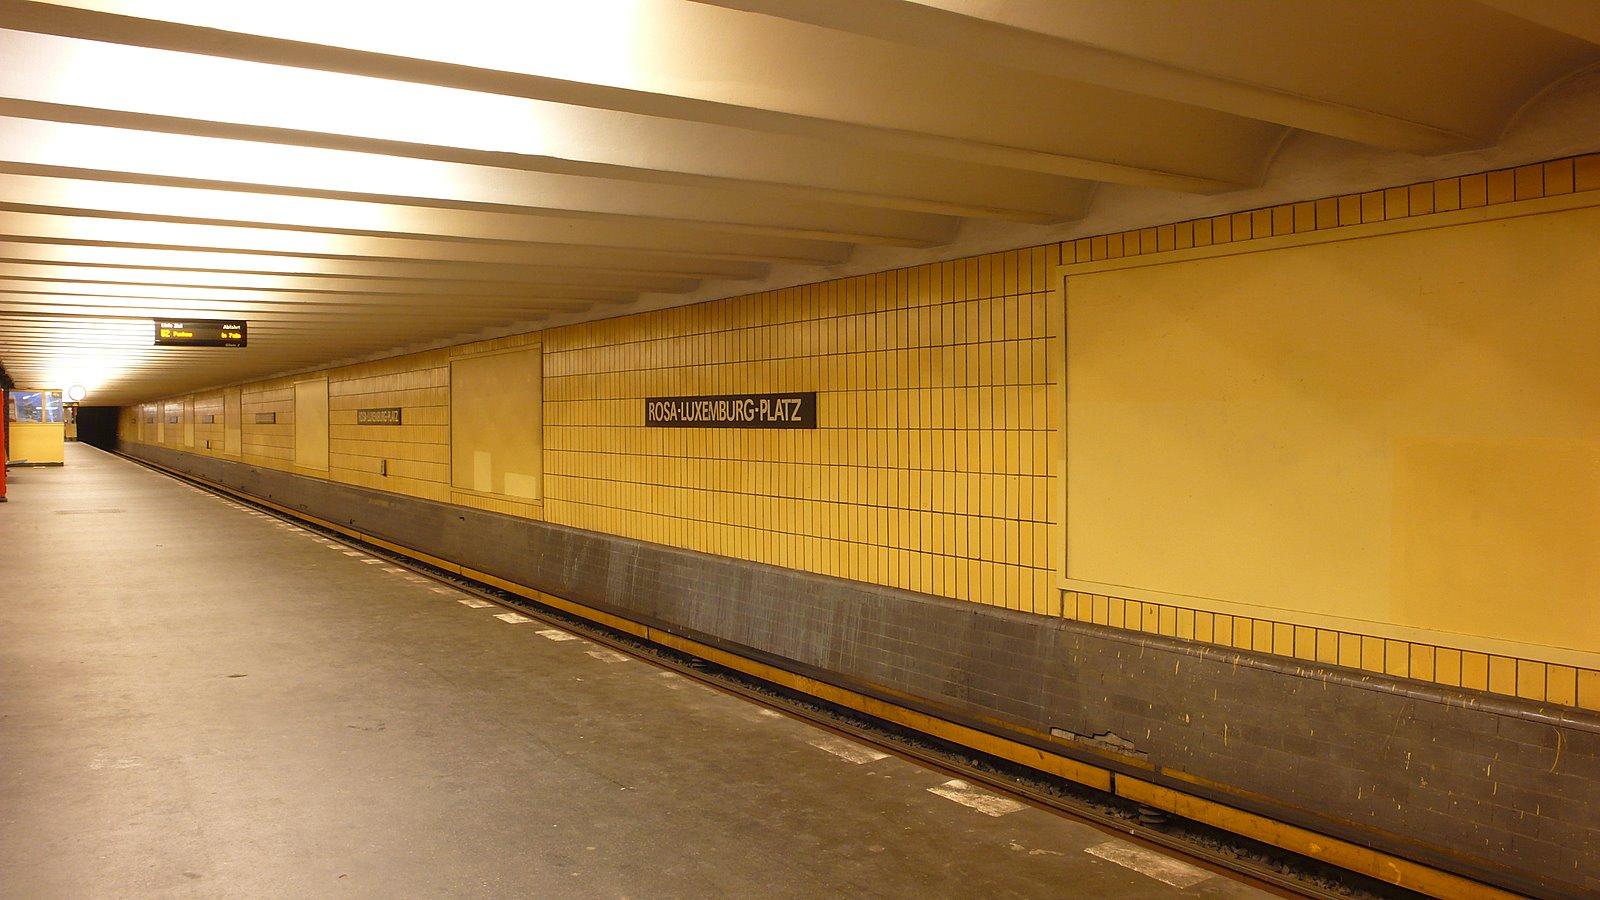 File U Bahnhof Rosa Luxemburg Platz Bahnsteig Jpg Wikimedia Commons